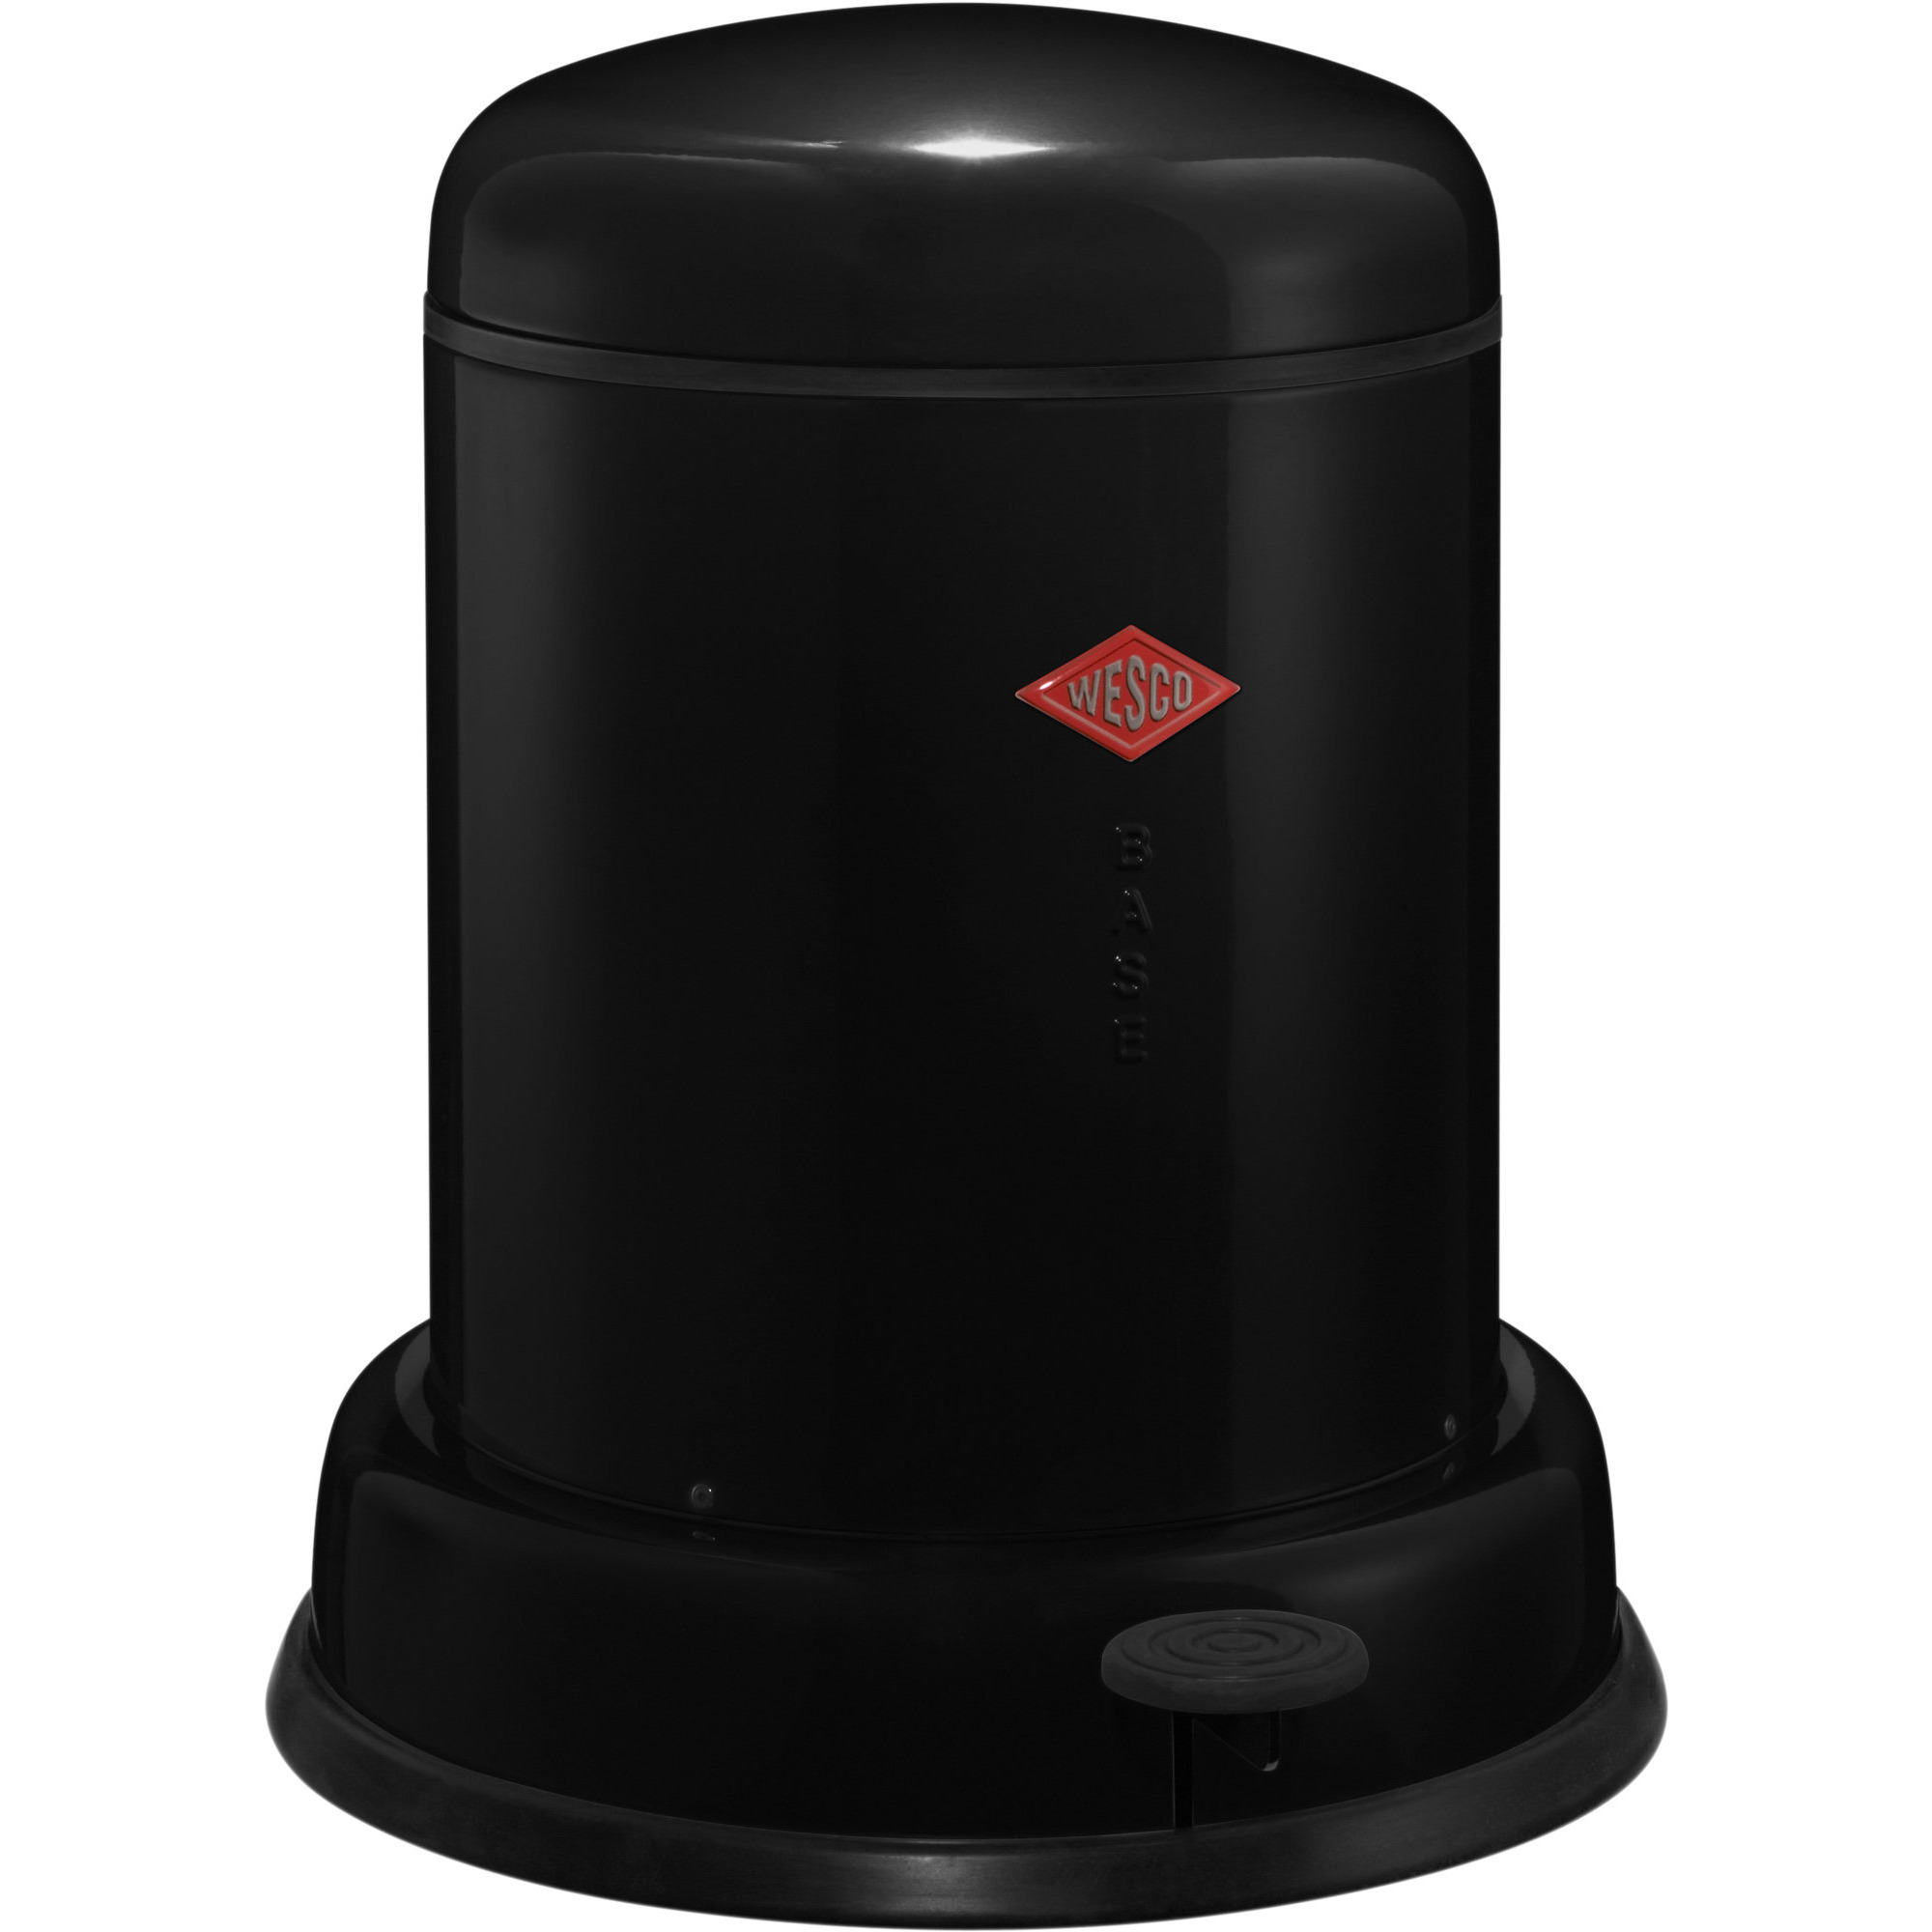 Wesco Baseboy pedalhink 8 liter – svart